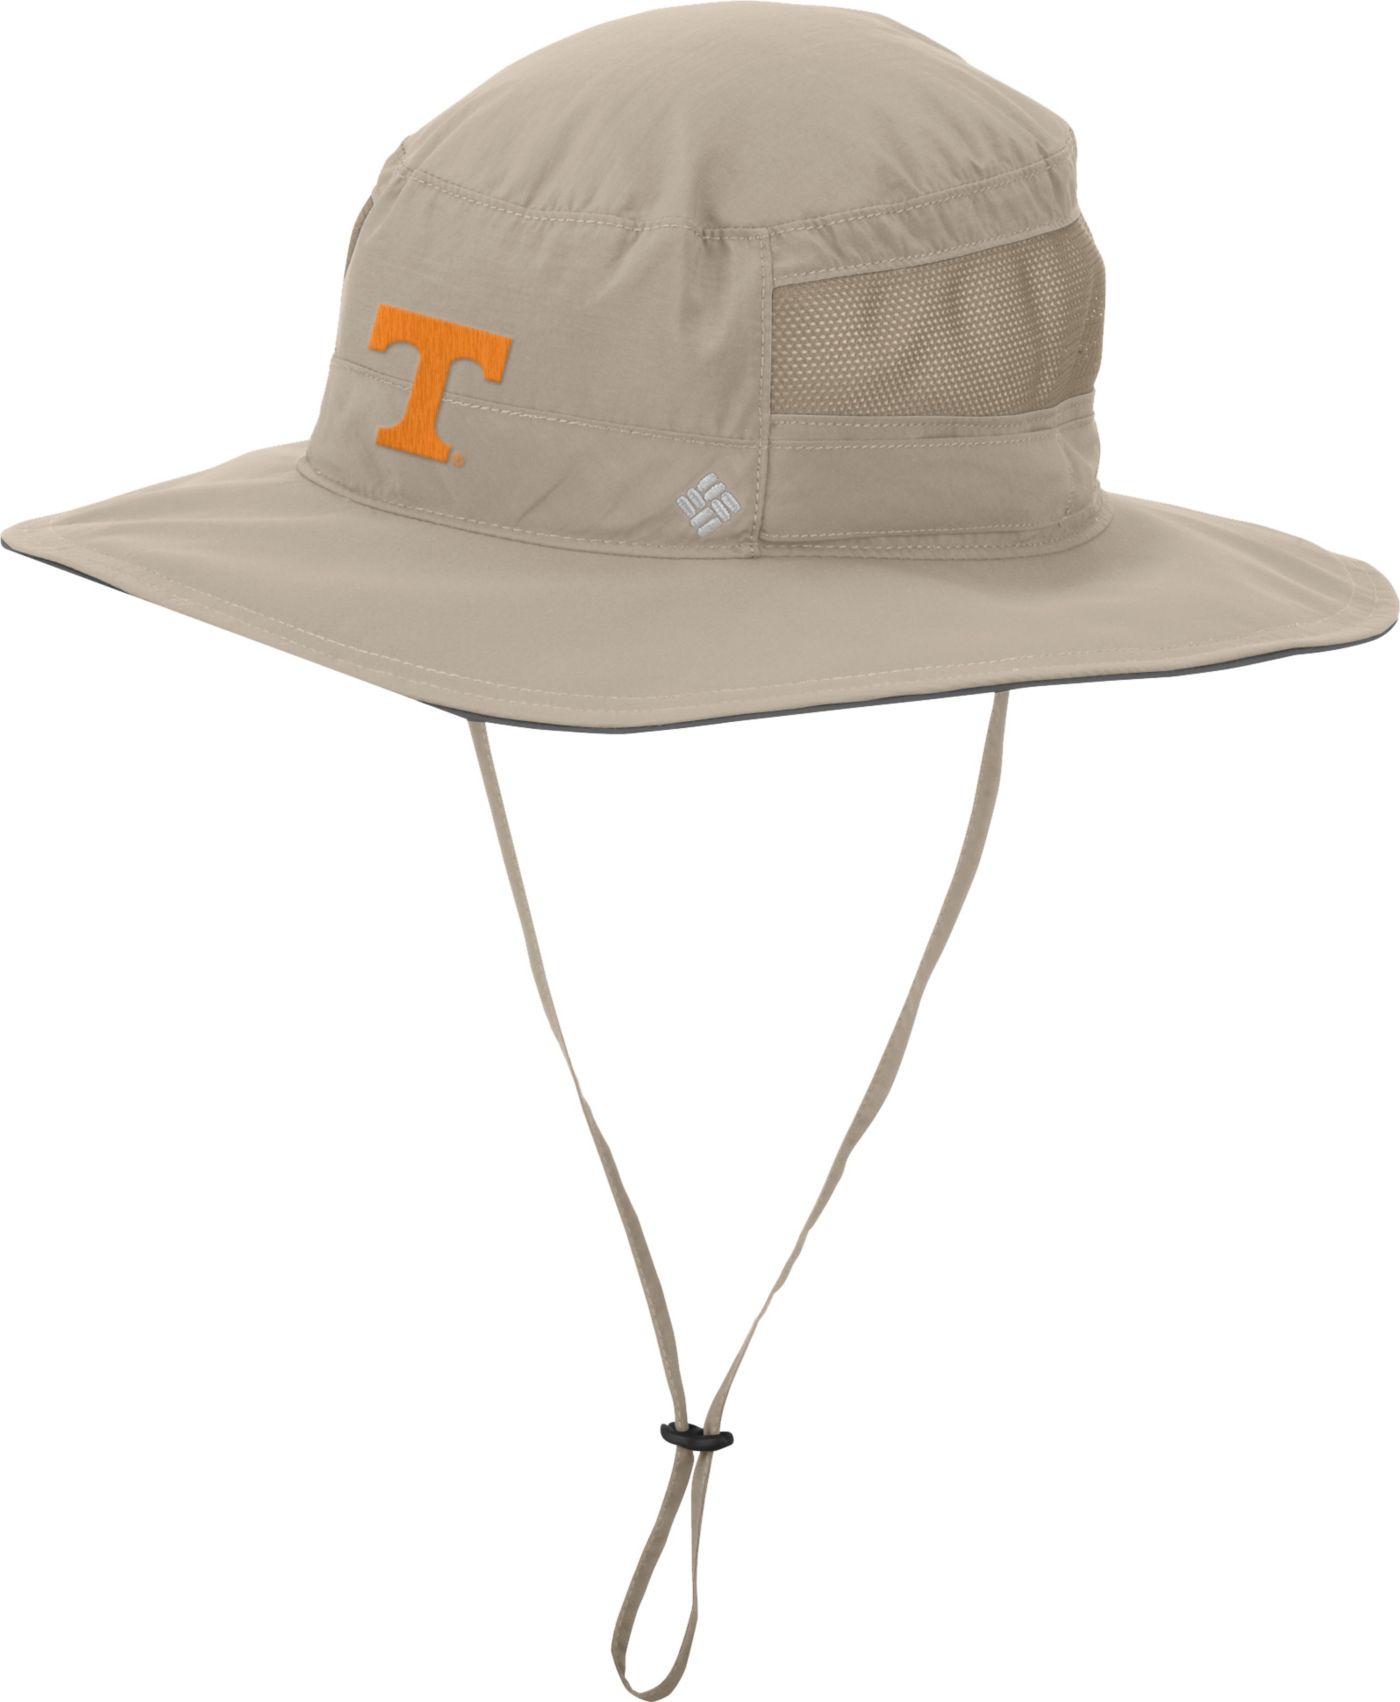 Columbia Men's Tennessee Volunteers Khaki Bora Bora Hat